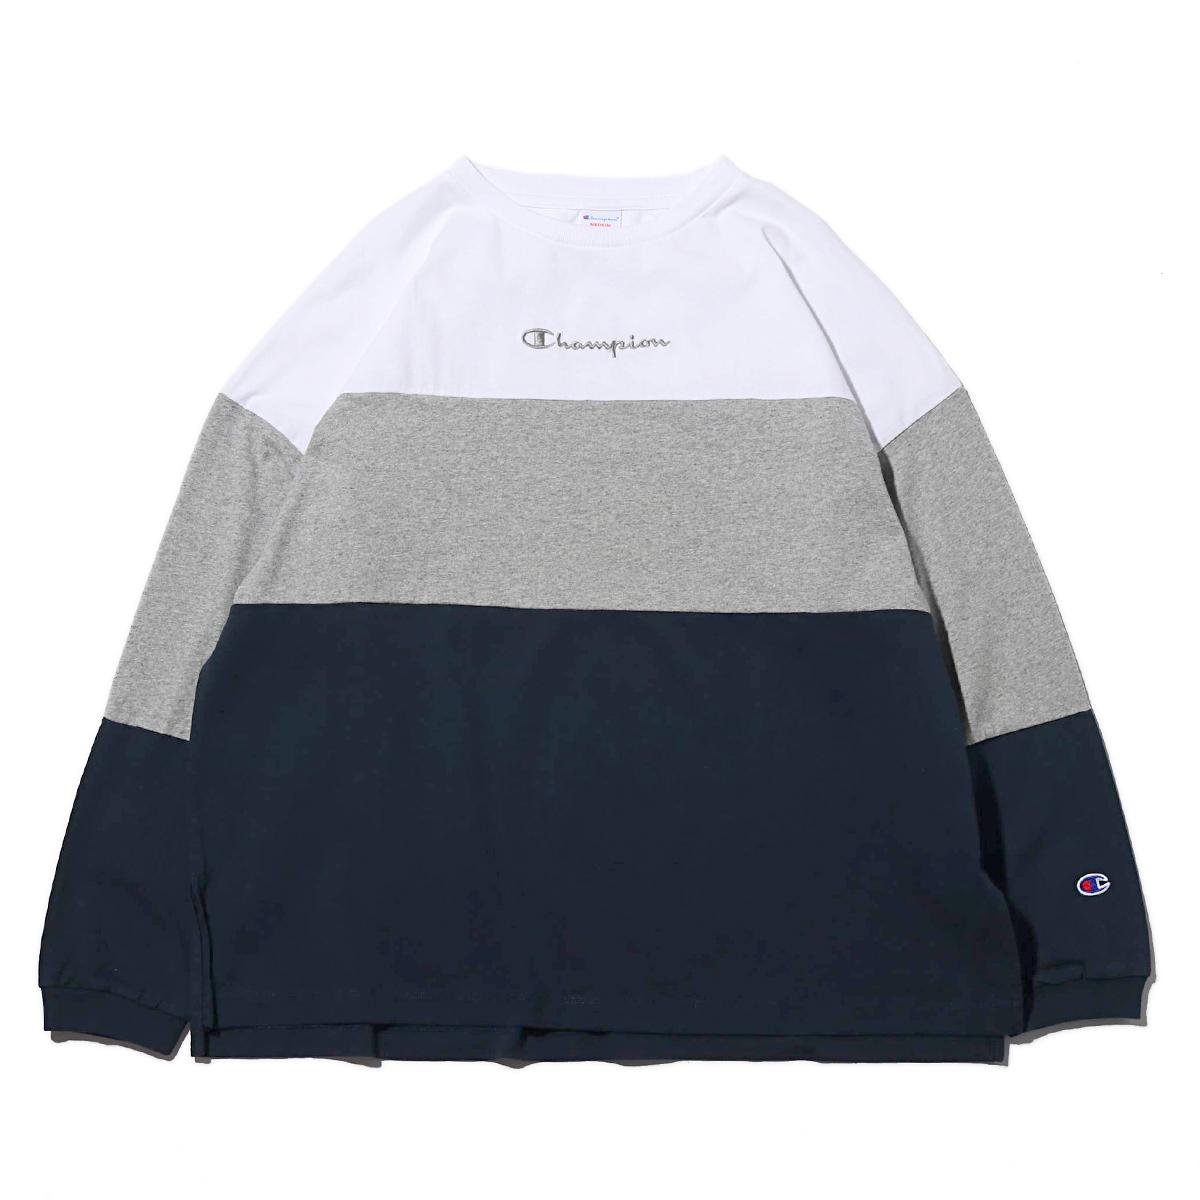 Champion LONG SLEEVE T-SHIRT (WHITE)(チャンピオン ロングスリーブ ティーシャツ)【メンズ】【長袖Tシャツ】【19SP-I】